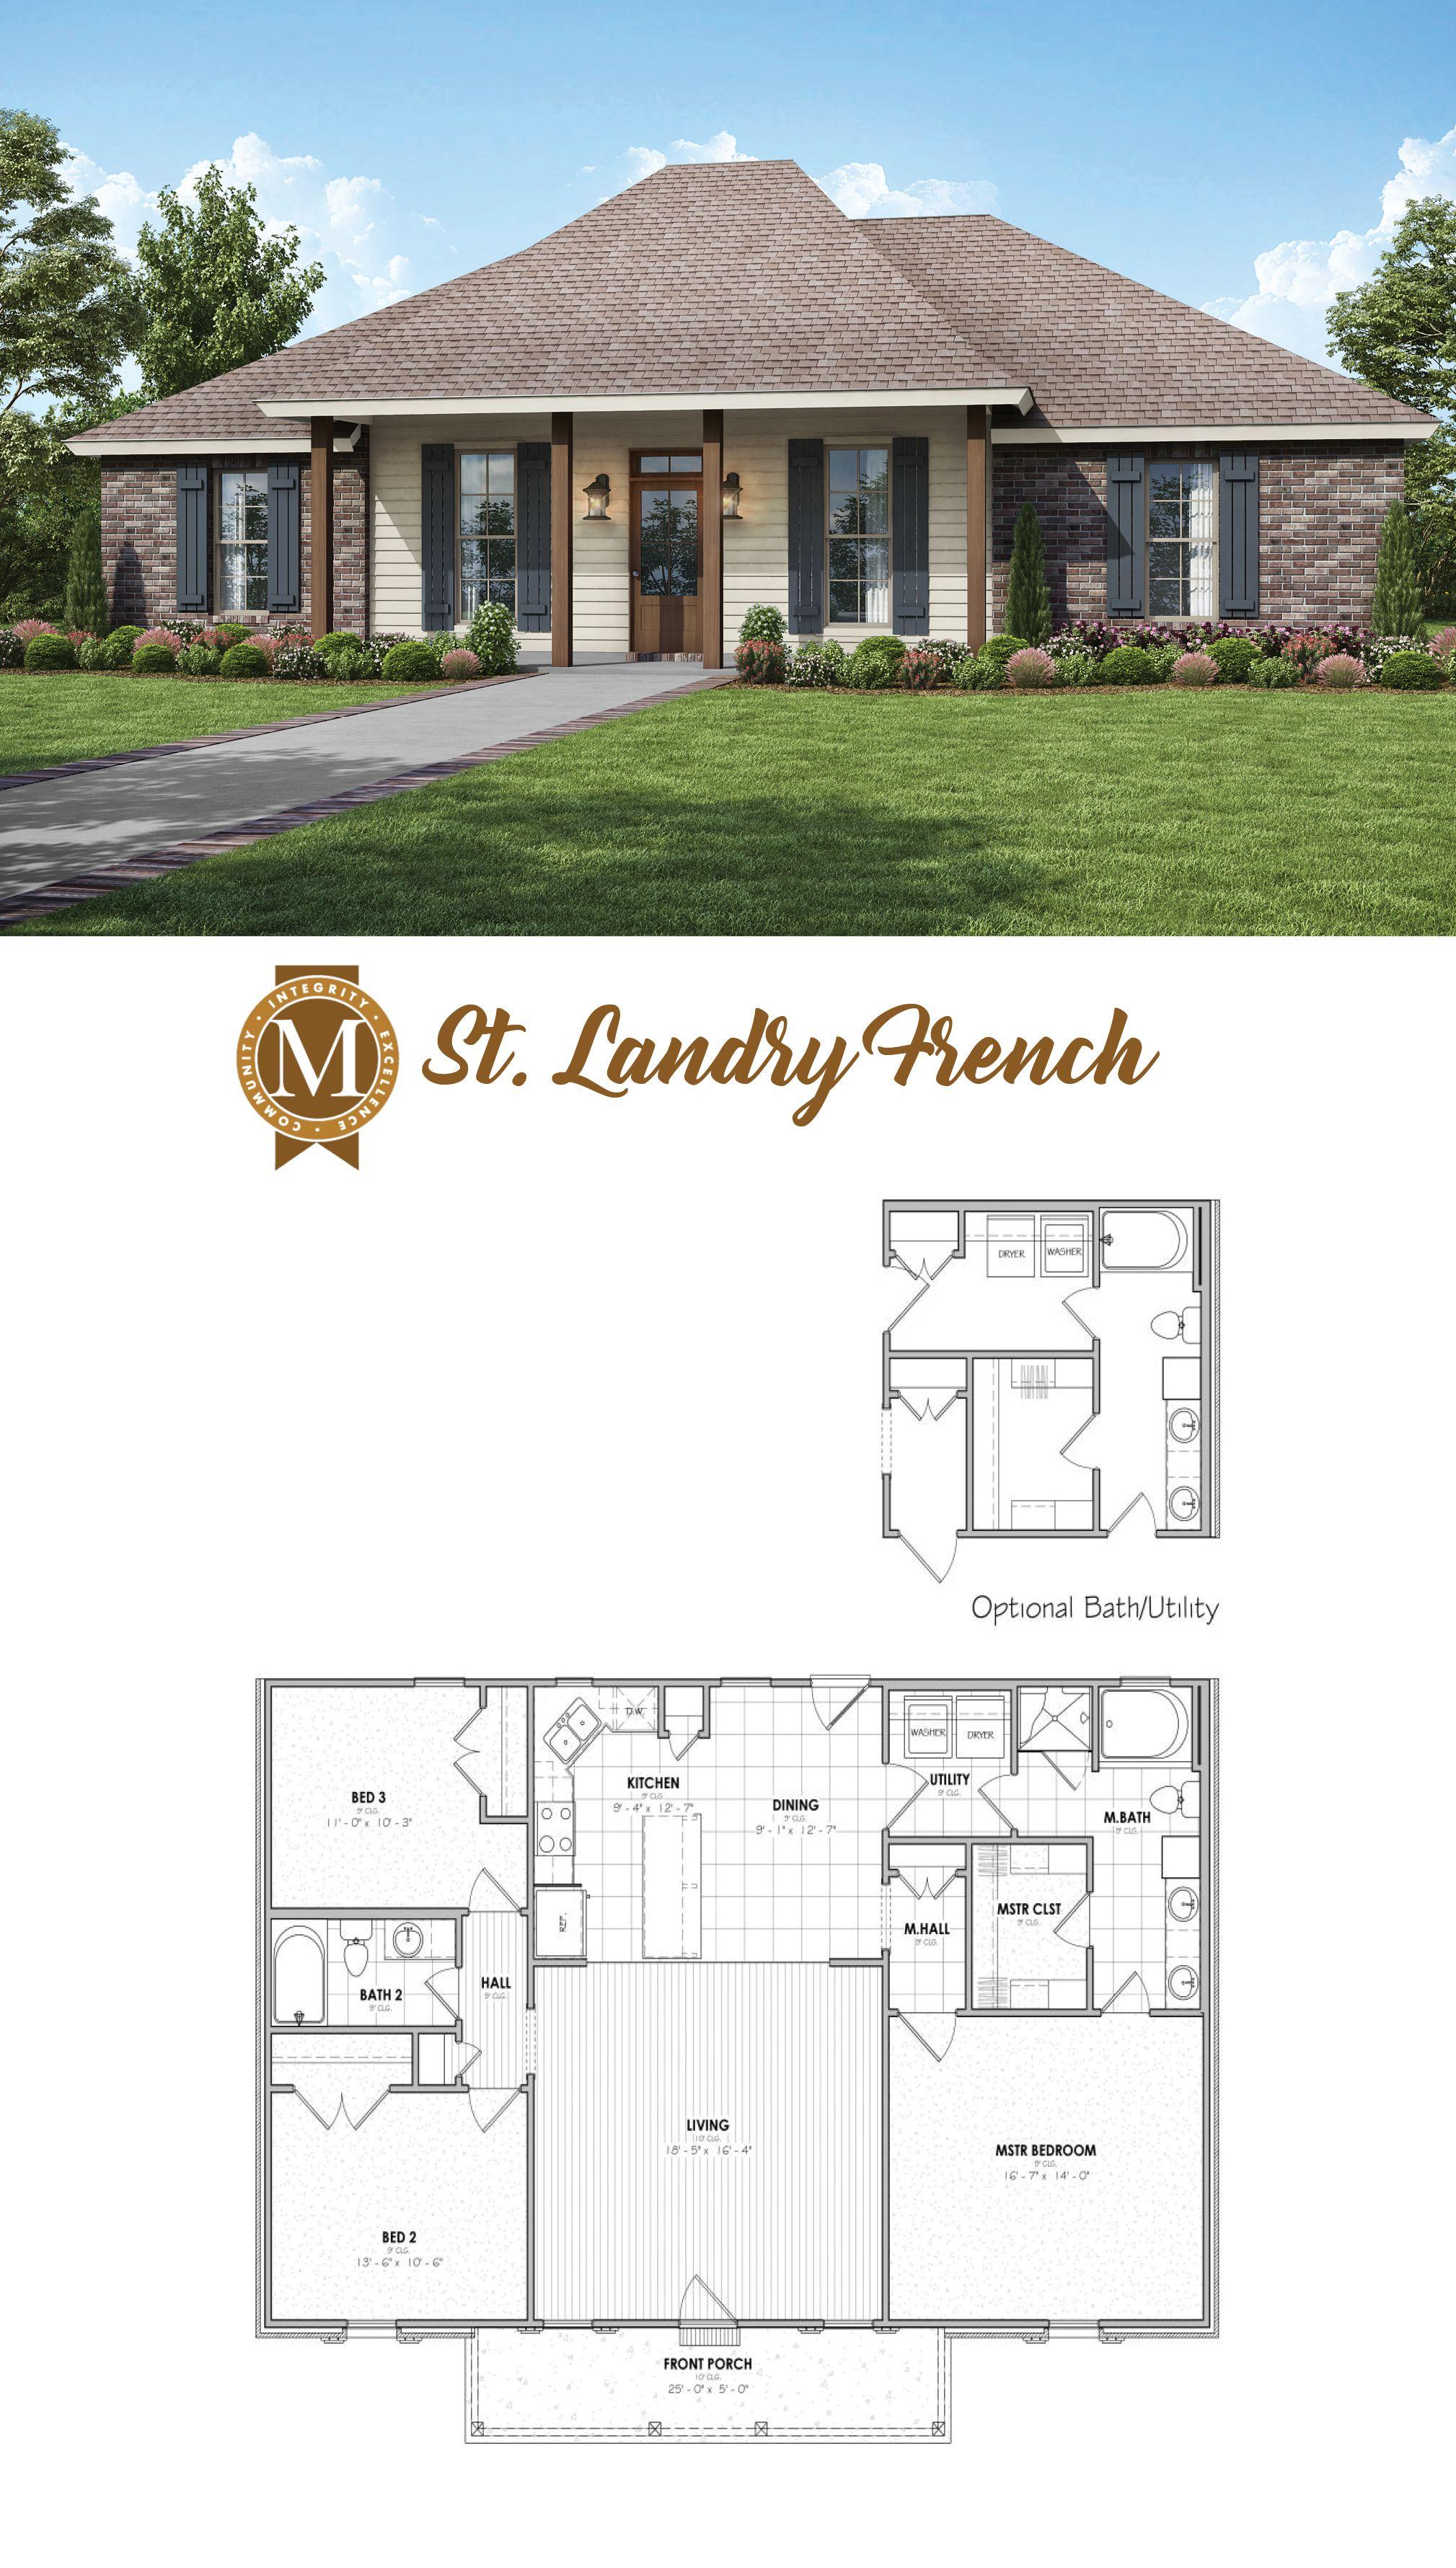 St Landry French Floor Plan Acadian House Plans House Plans New House Plans